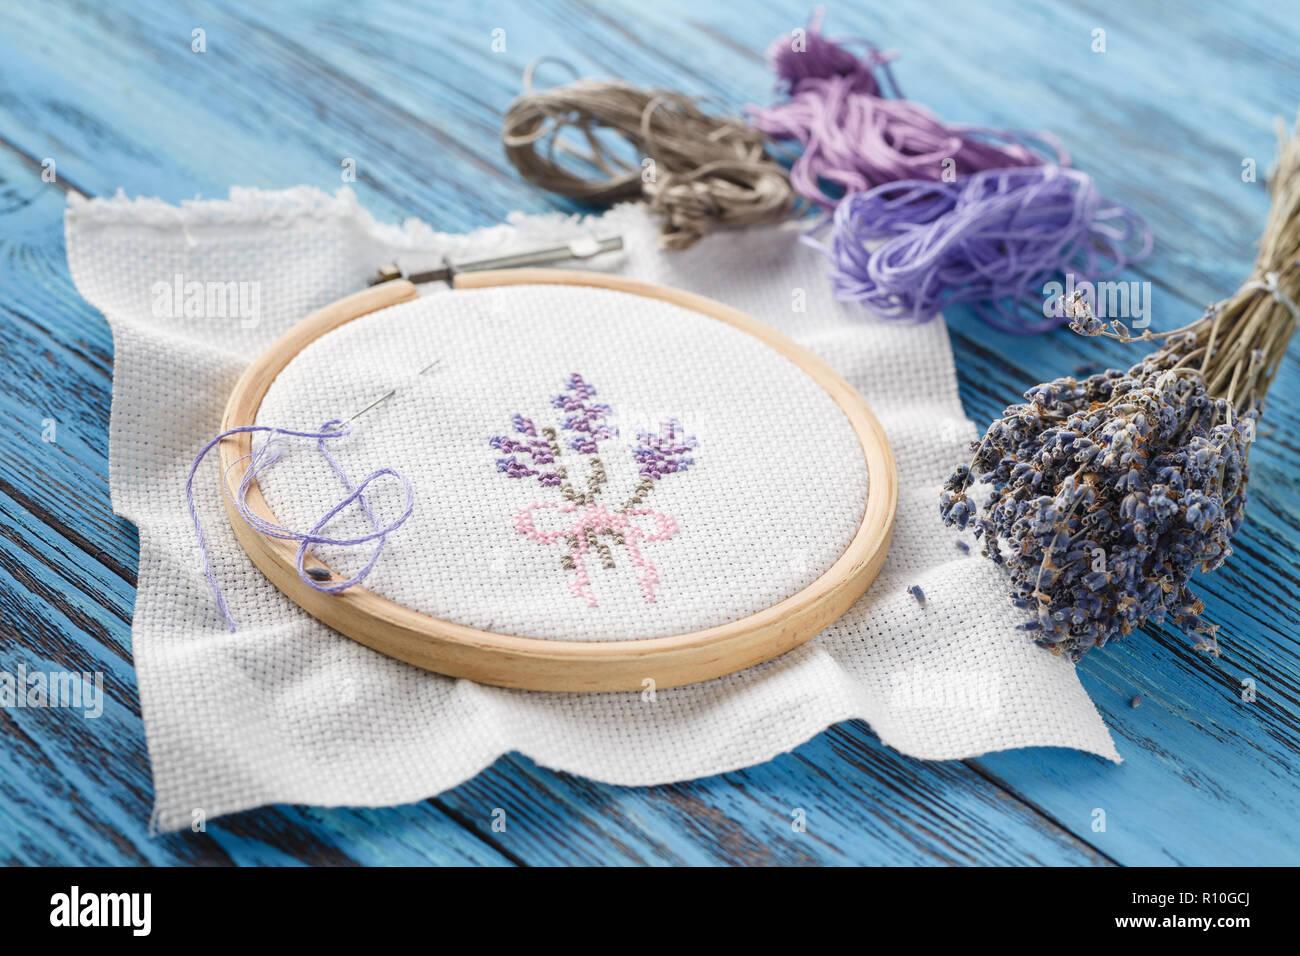 Provence Fabric Imágenes De Stock & Provence Fabric Fotos De Stock ...